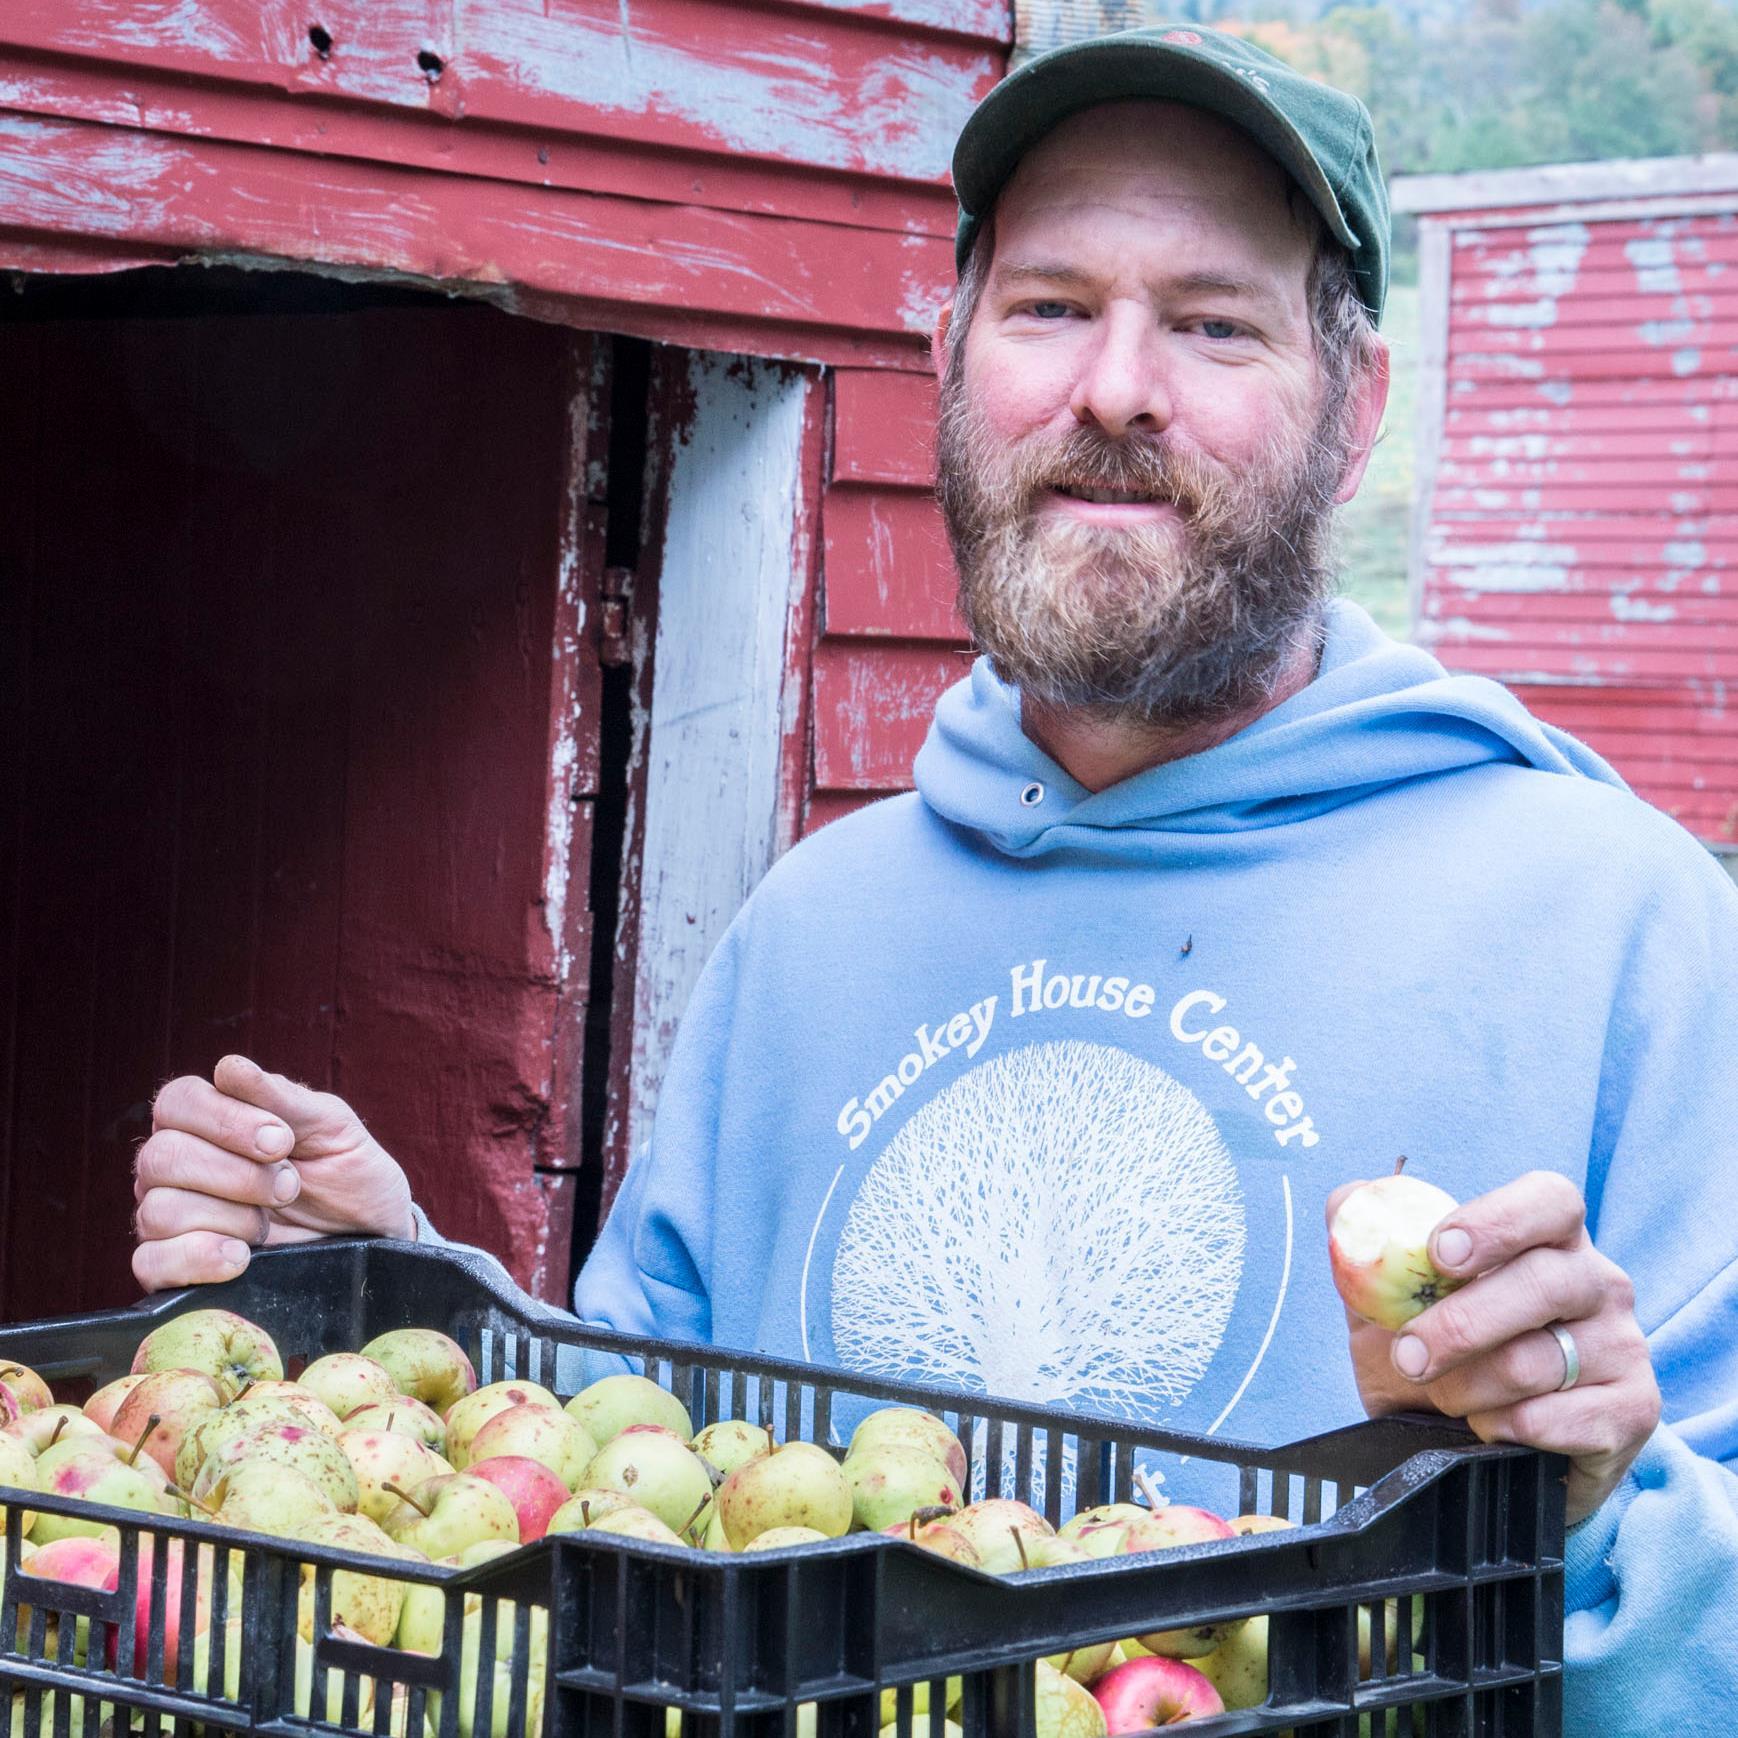 Ryan Yoder of Yoder Farm